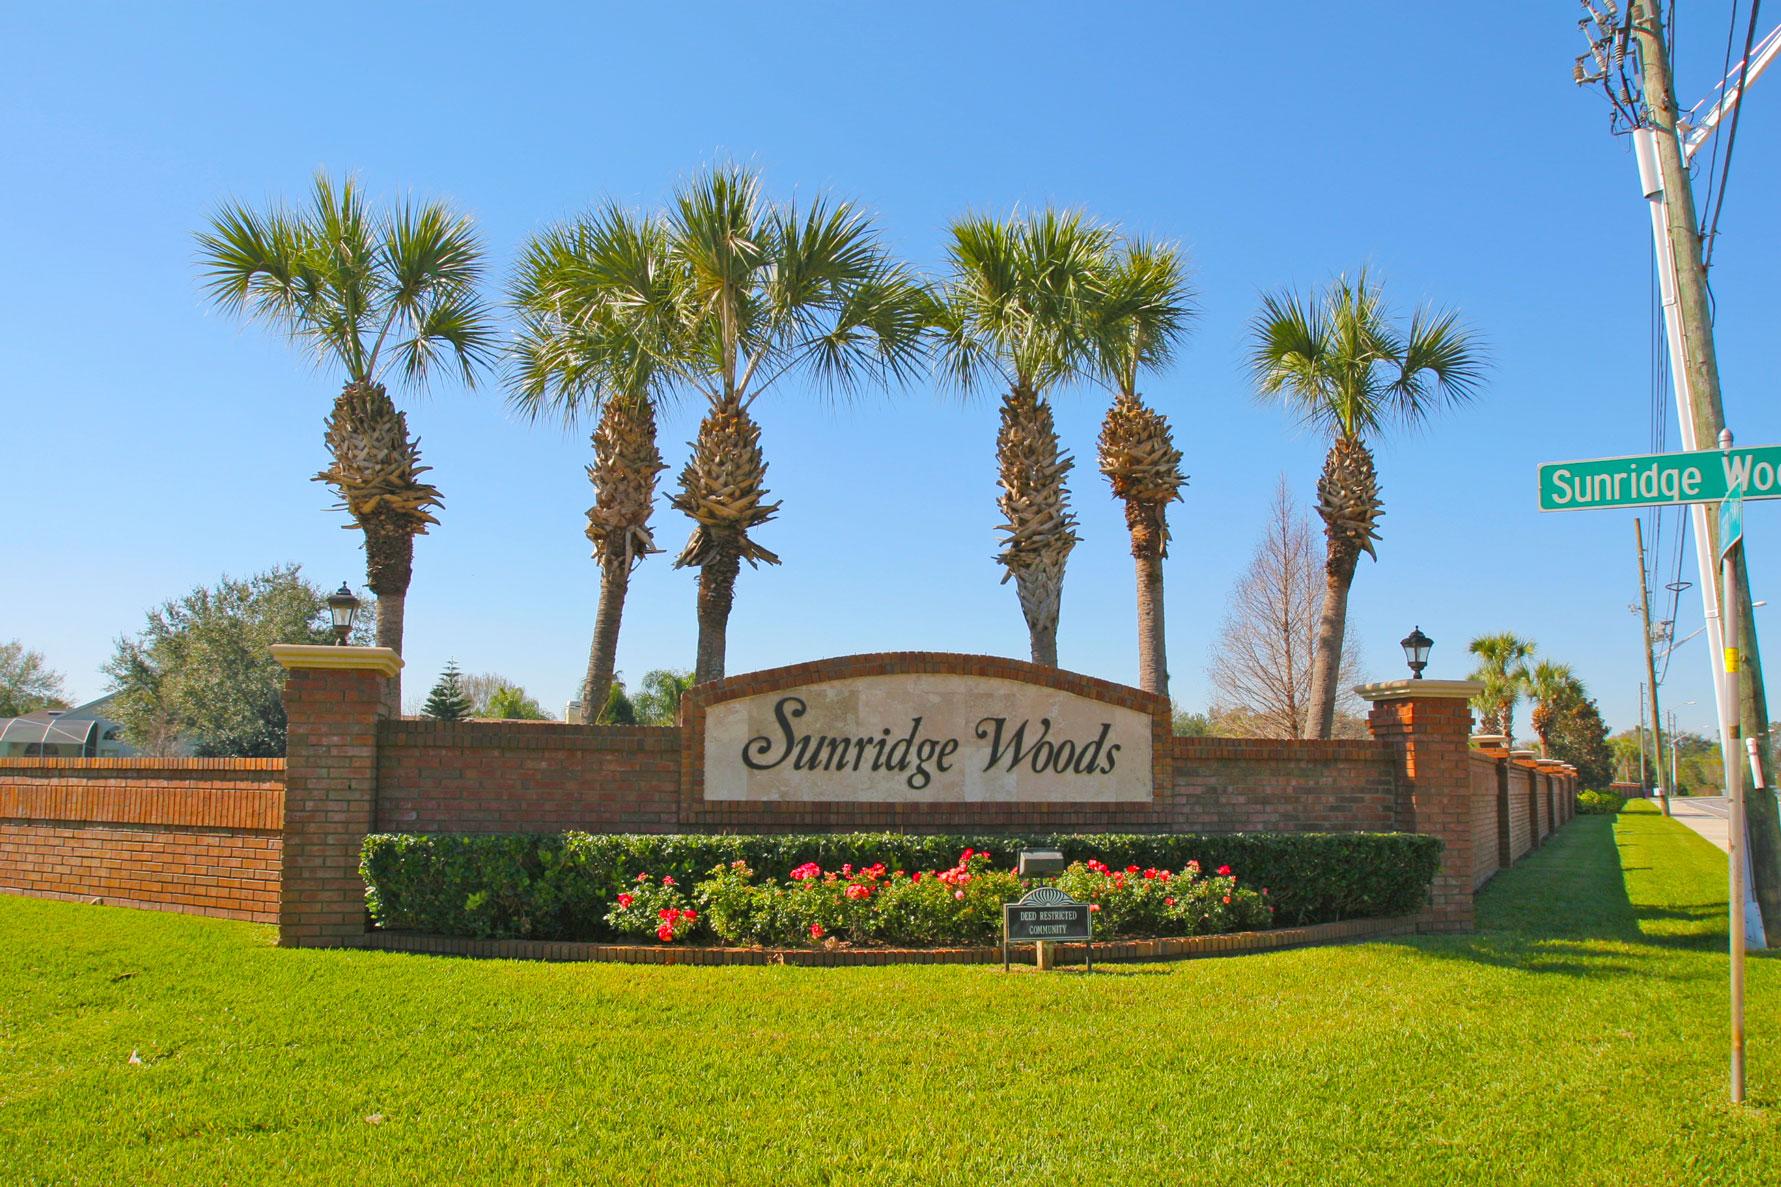 Sunridge-Woods